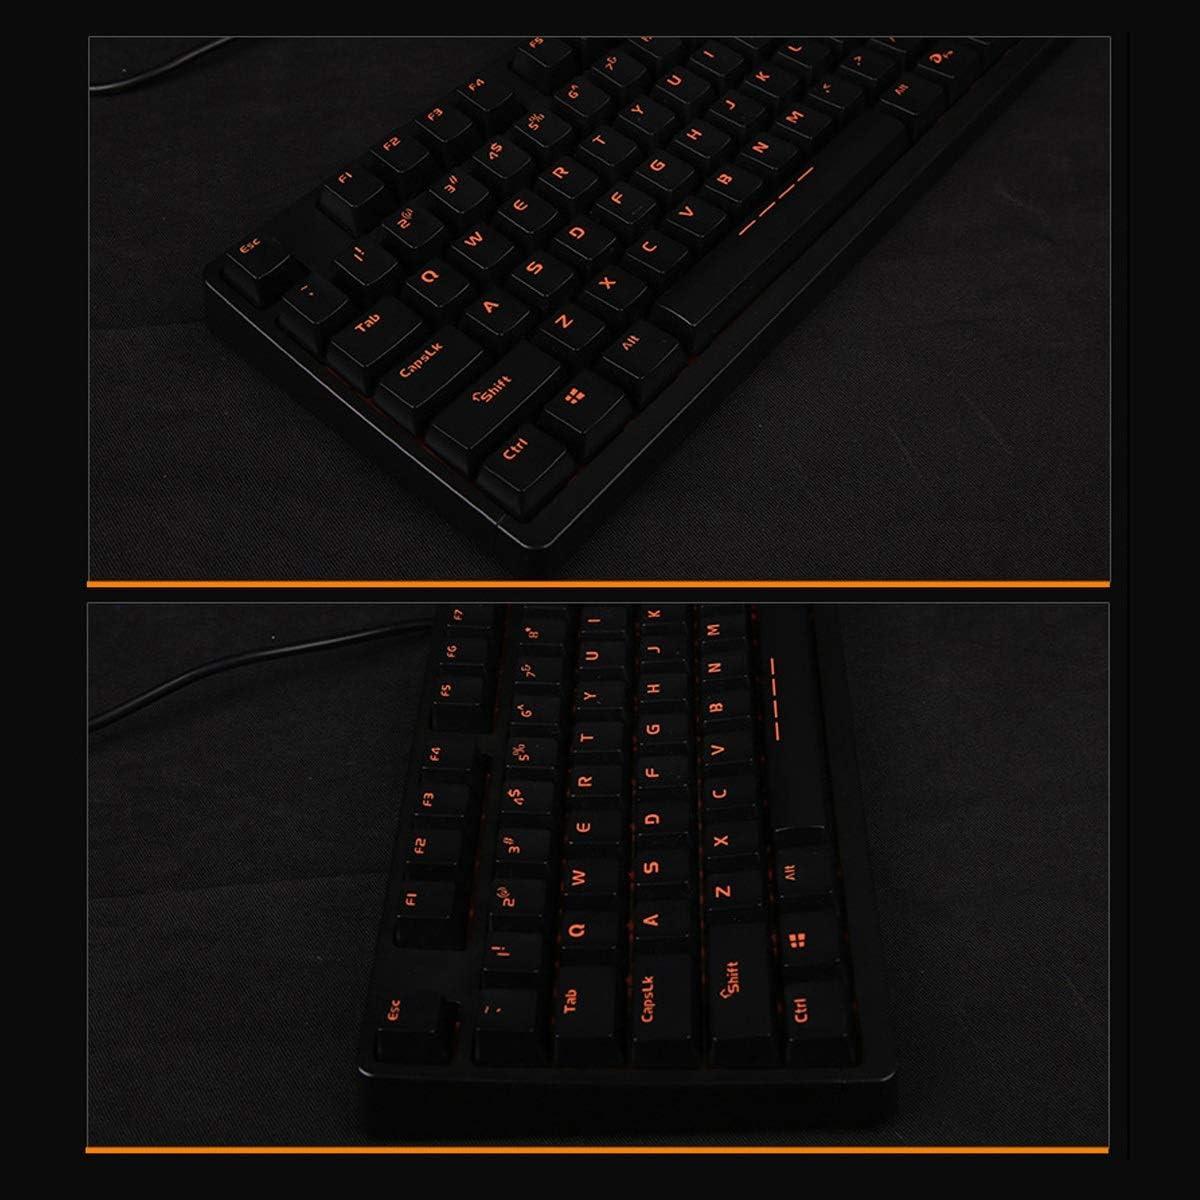 Entry-Level Five-Color Backlit Desktop Laptop PUBG//LOL Gaming Peripherals Blue//Black Key Axis Excellent Quality Color : Blue Black Keyboard 104 Keys Haoyushangmao Mechanical Keyboard